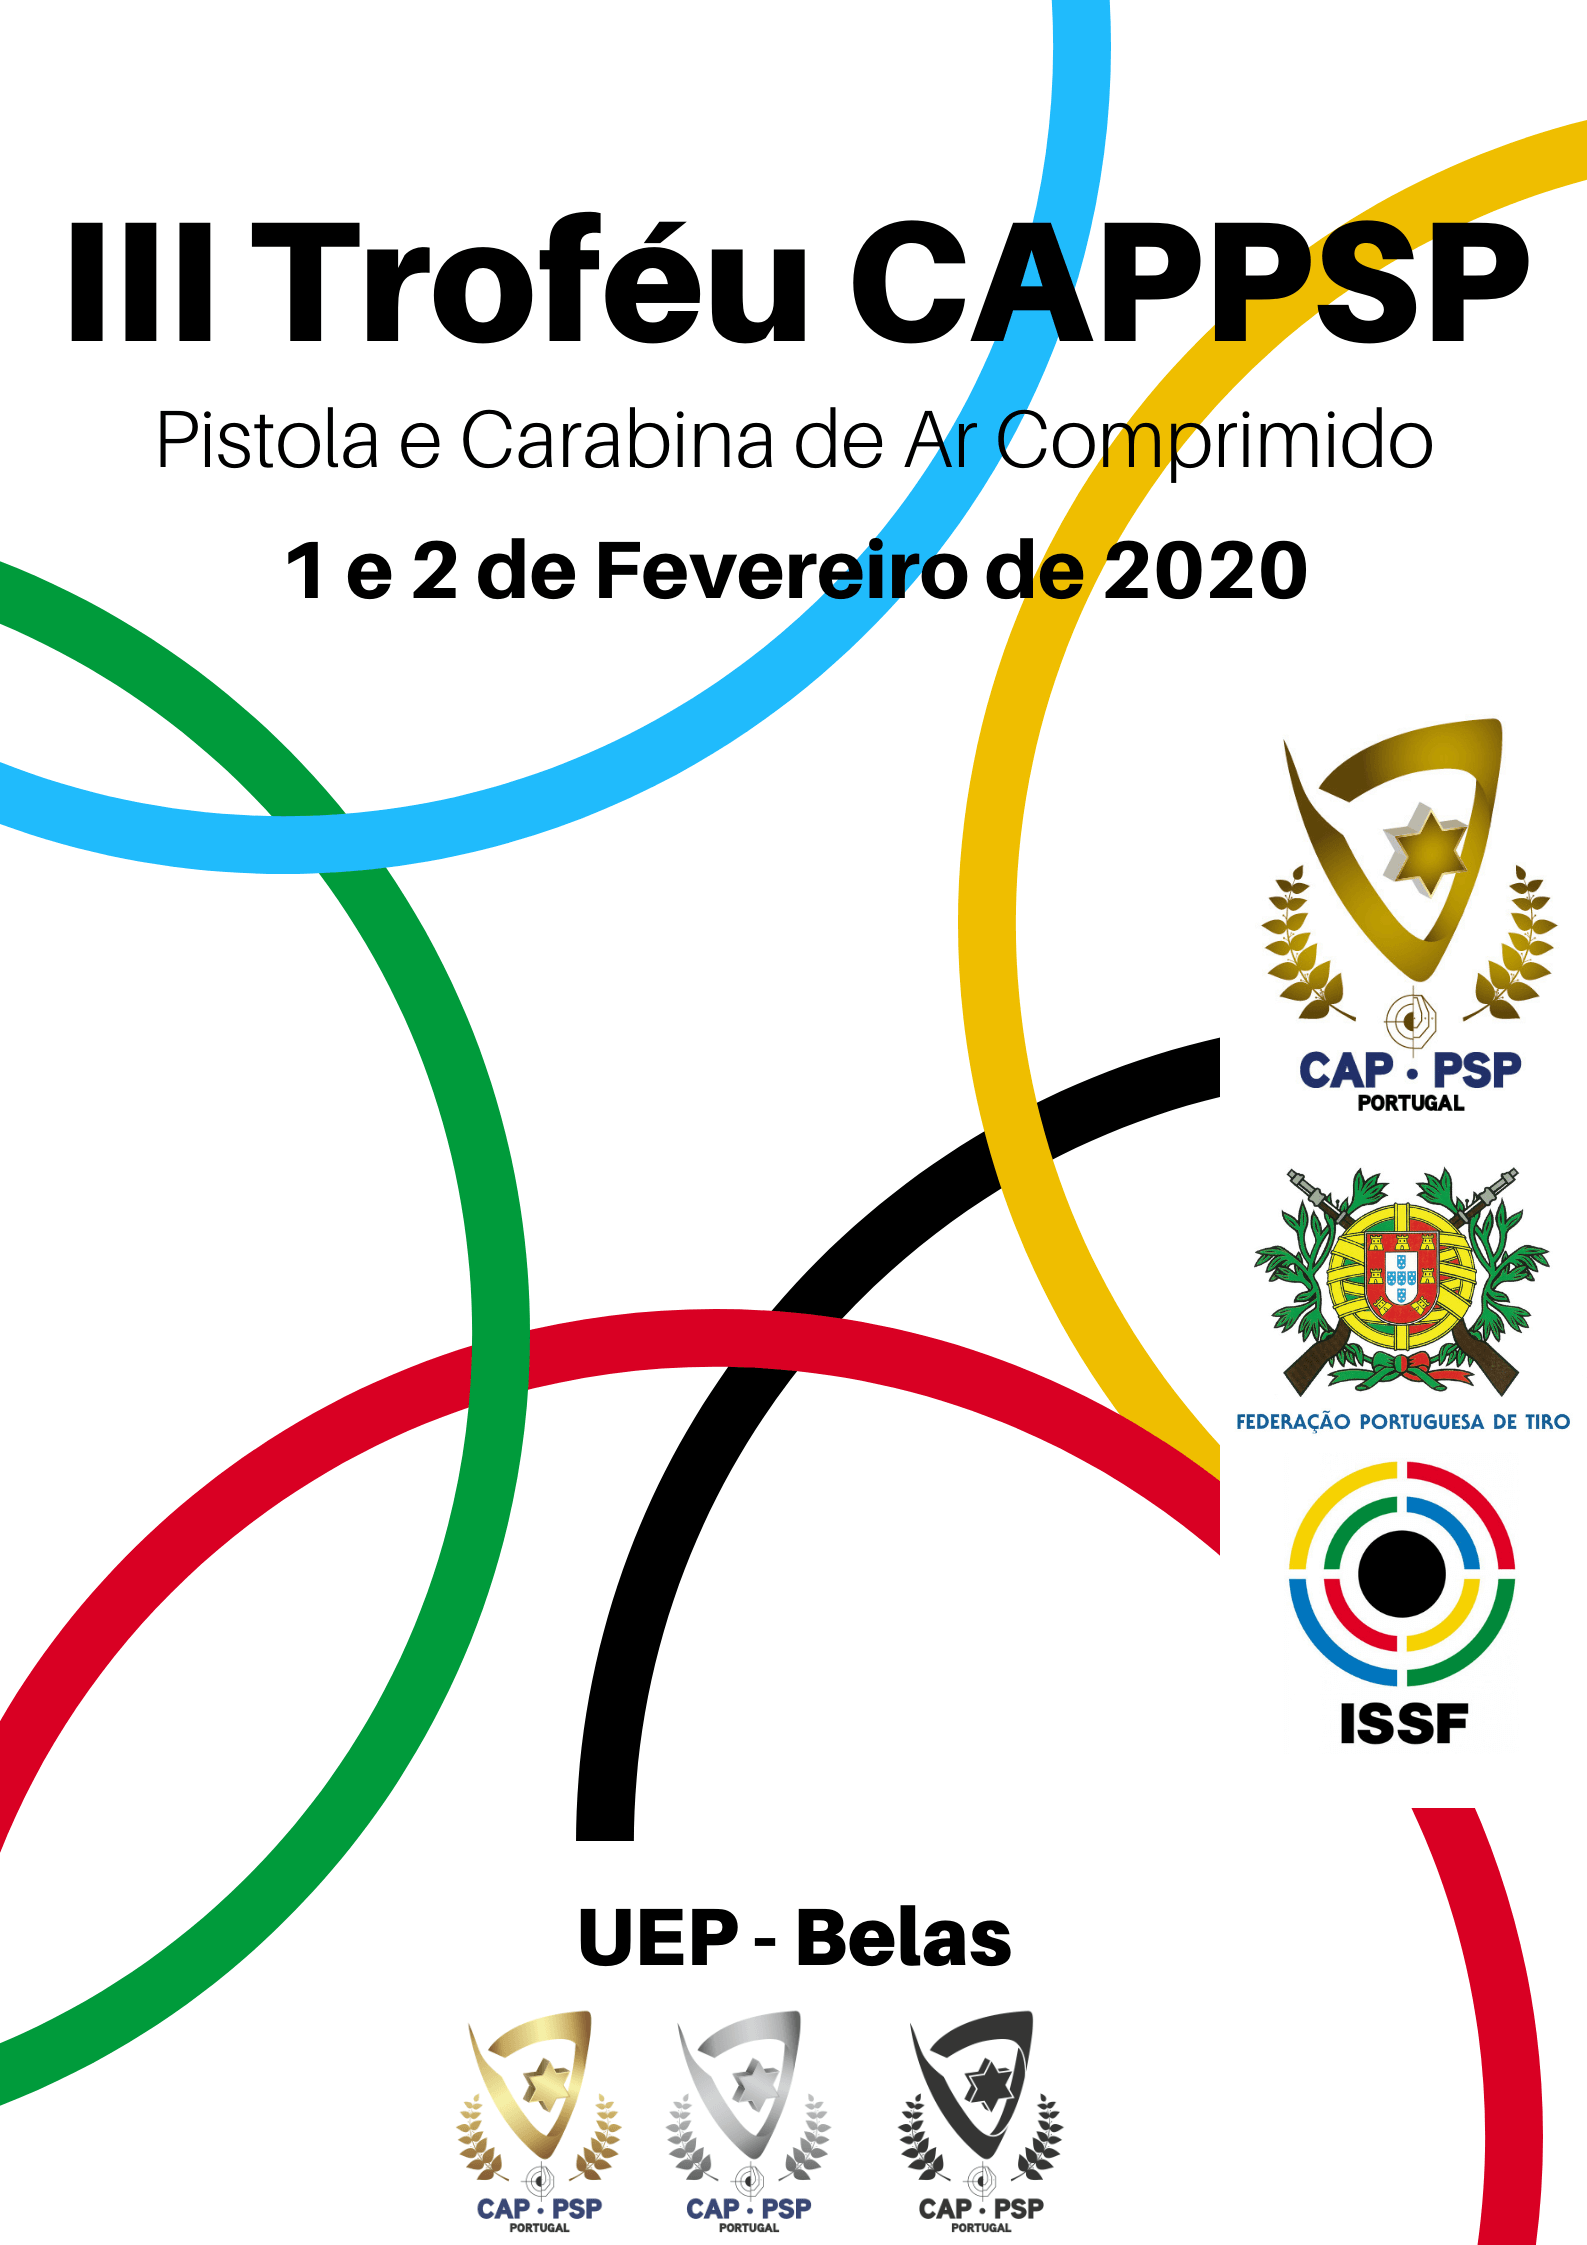 III Troféu CAPPSP 2020